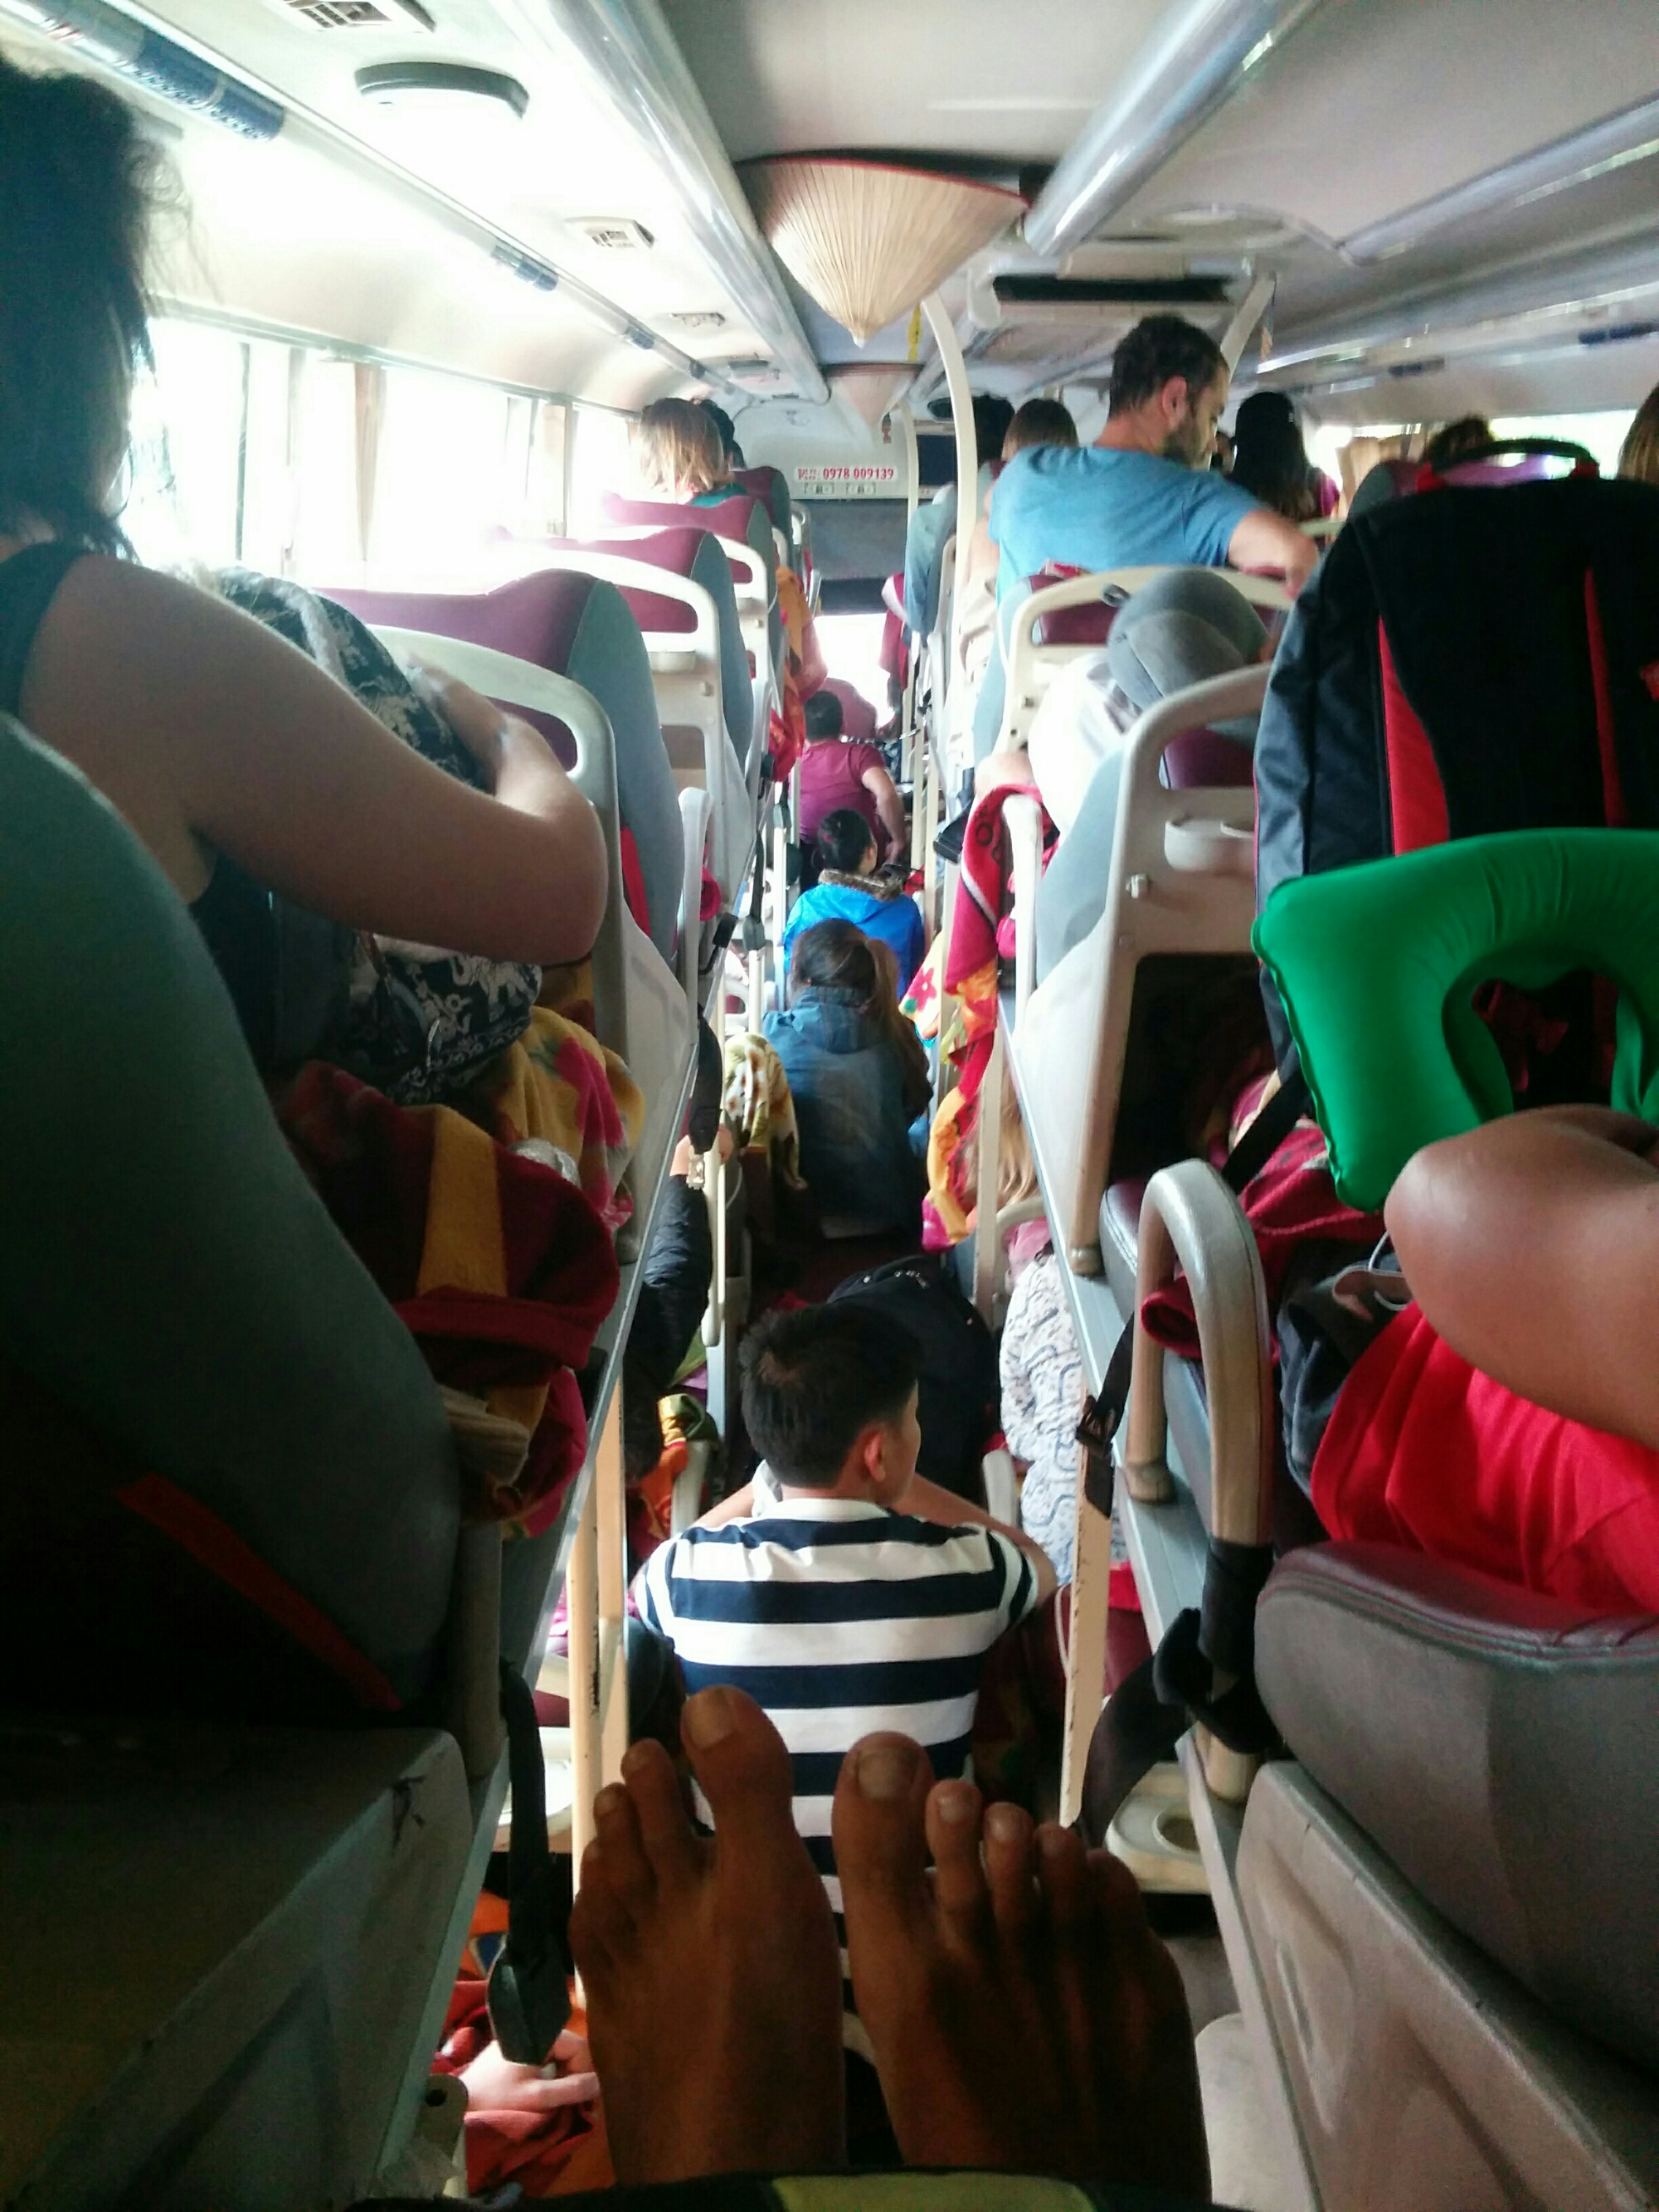 Crammed night bus